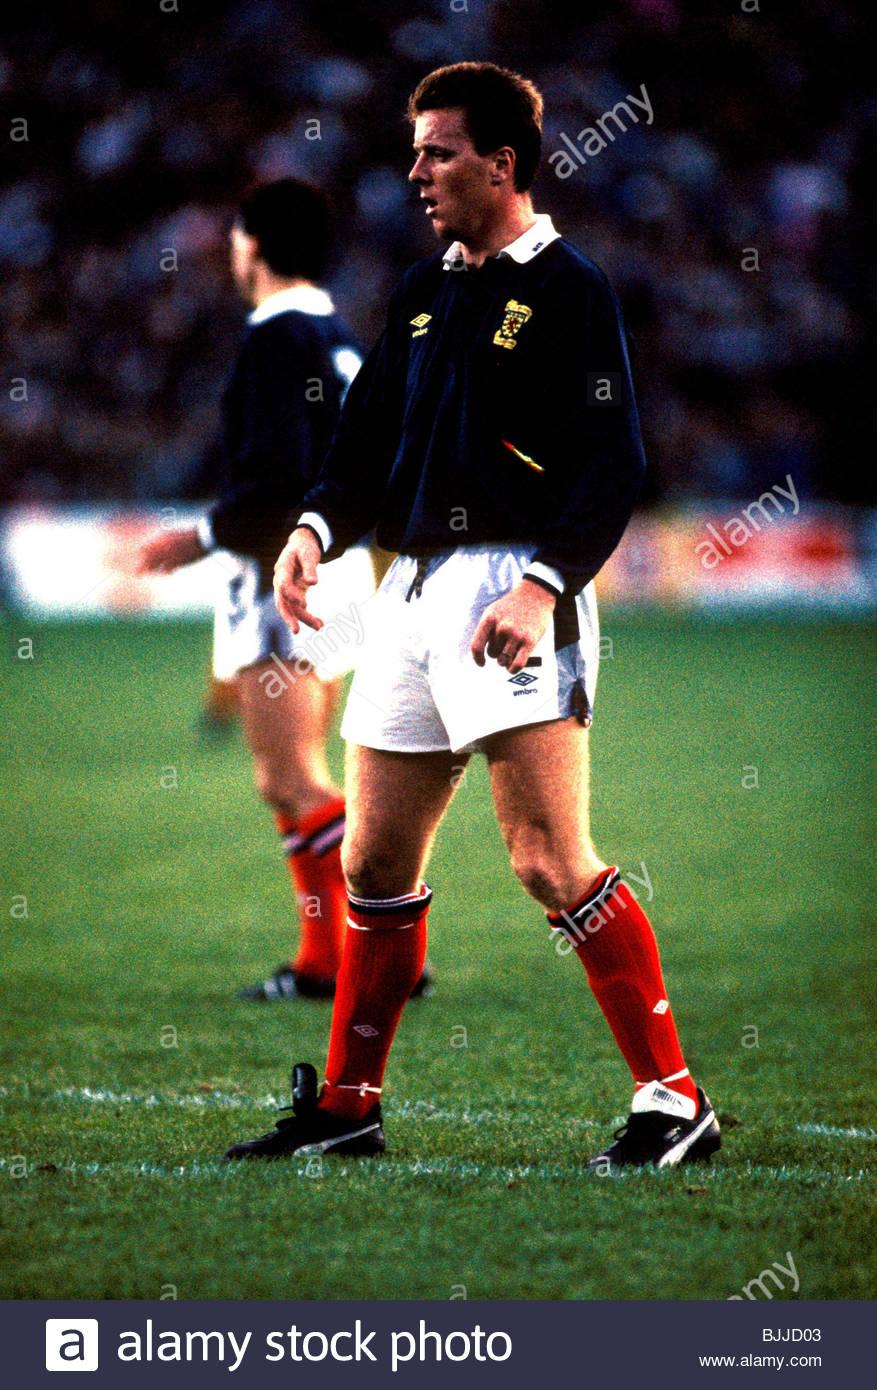 14/09/88 WORLD CUP QUALIFIER NORWAY V SCOTLAND (1-2) ULLEVAAL STADIUM - OSLO Scotland's Steve Nicol - Stock Image